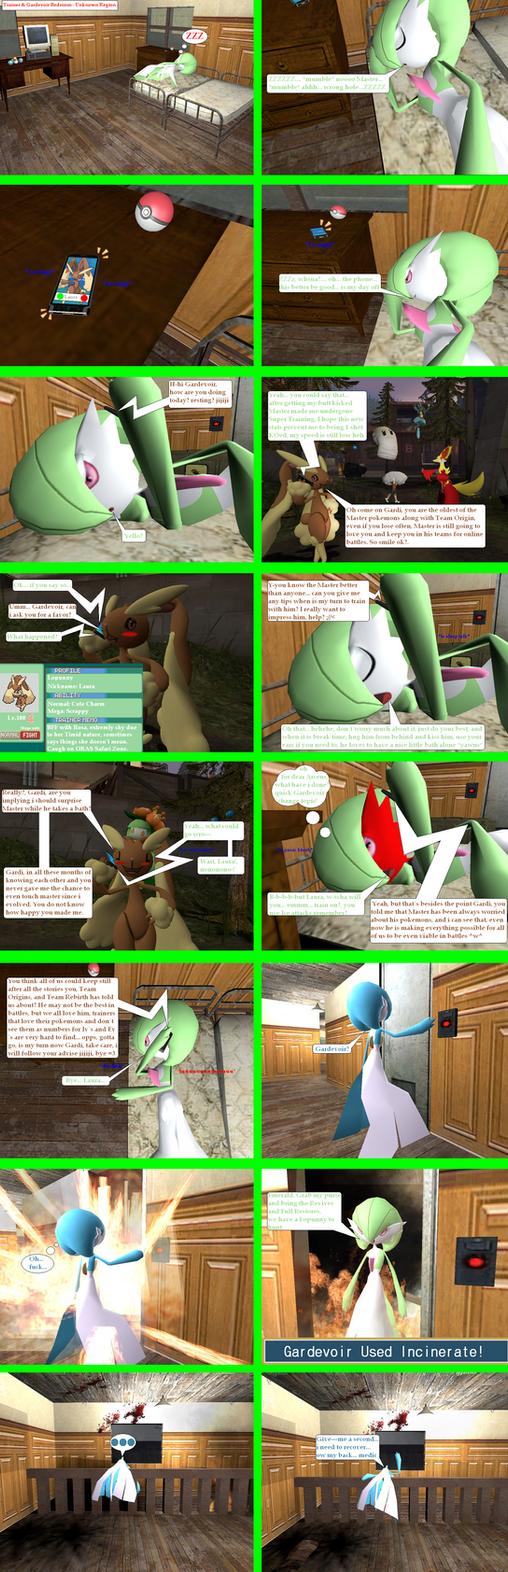 Pokemon Comic 3- Major Screw Up - by TeamInTheDarkness